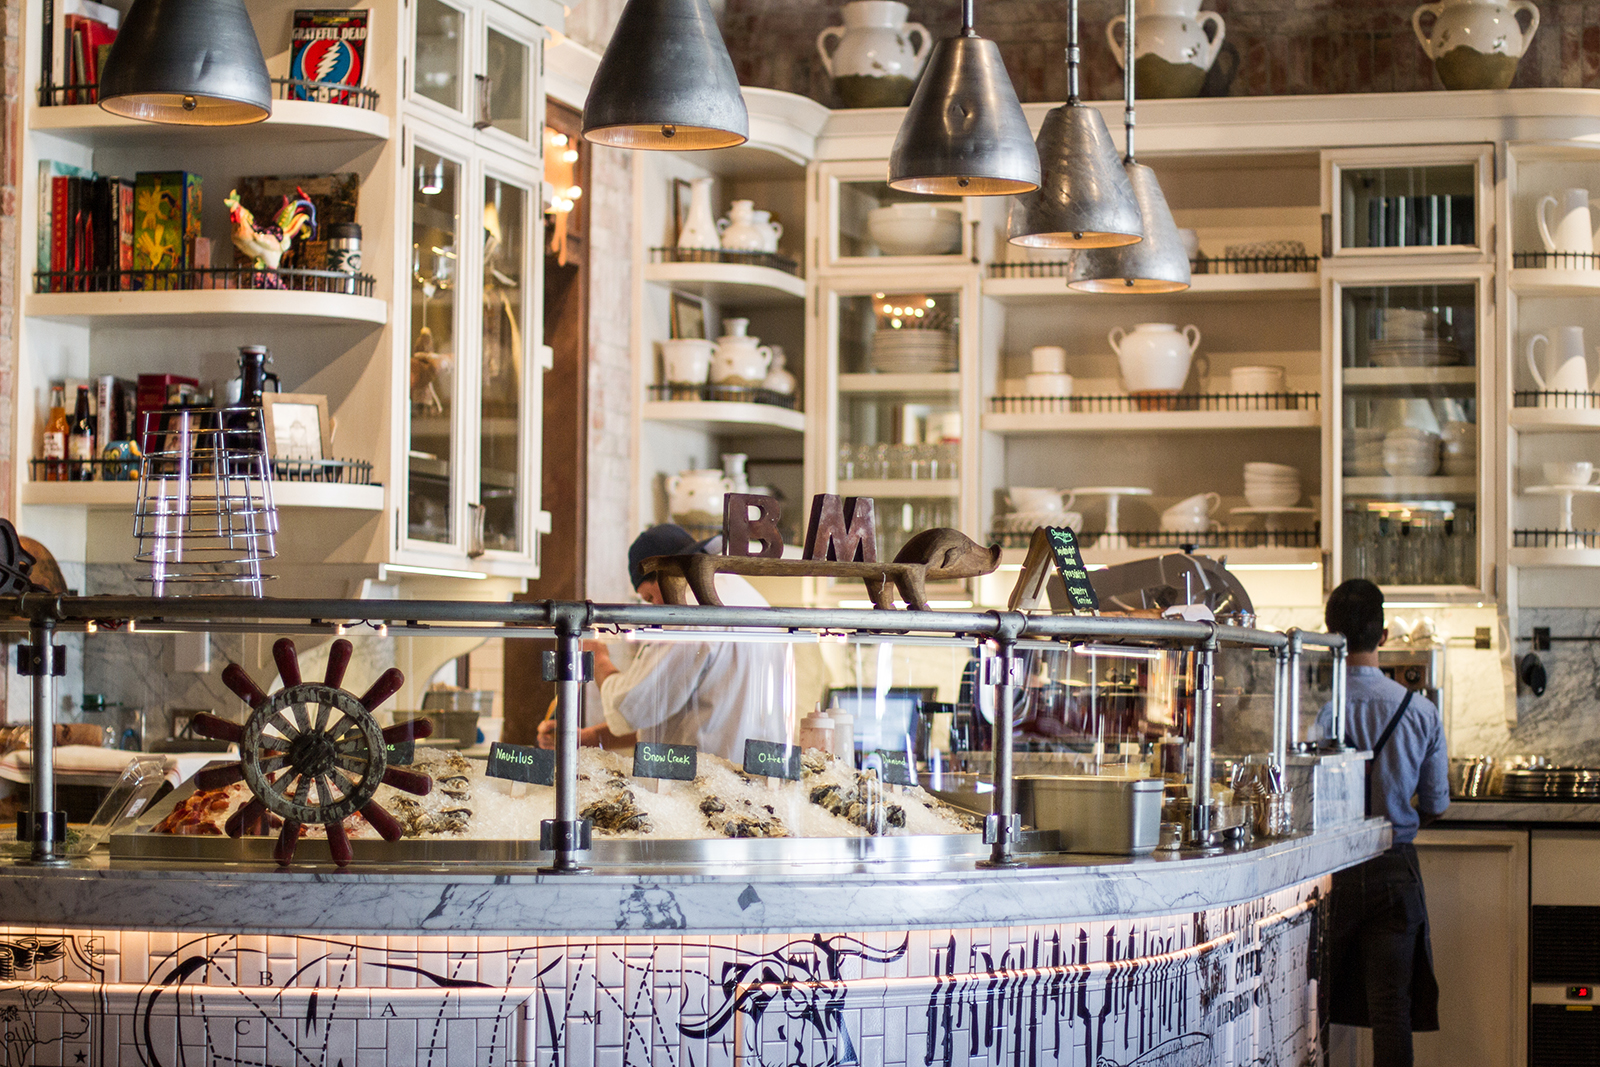 Hearthstone Kitchen & Cellar, Las Vegas | desertfroth.com